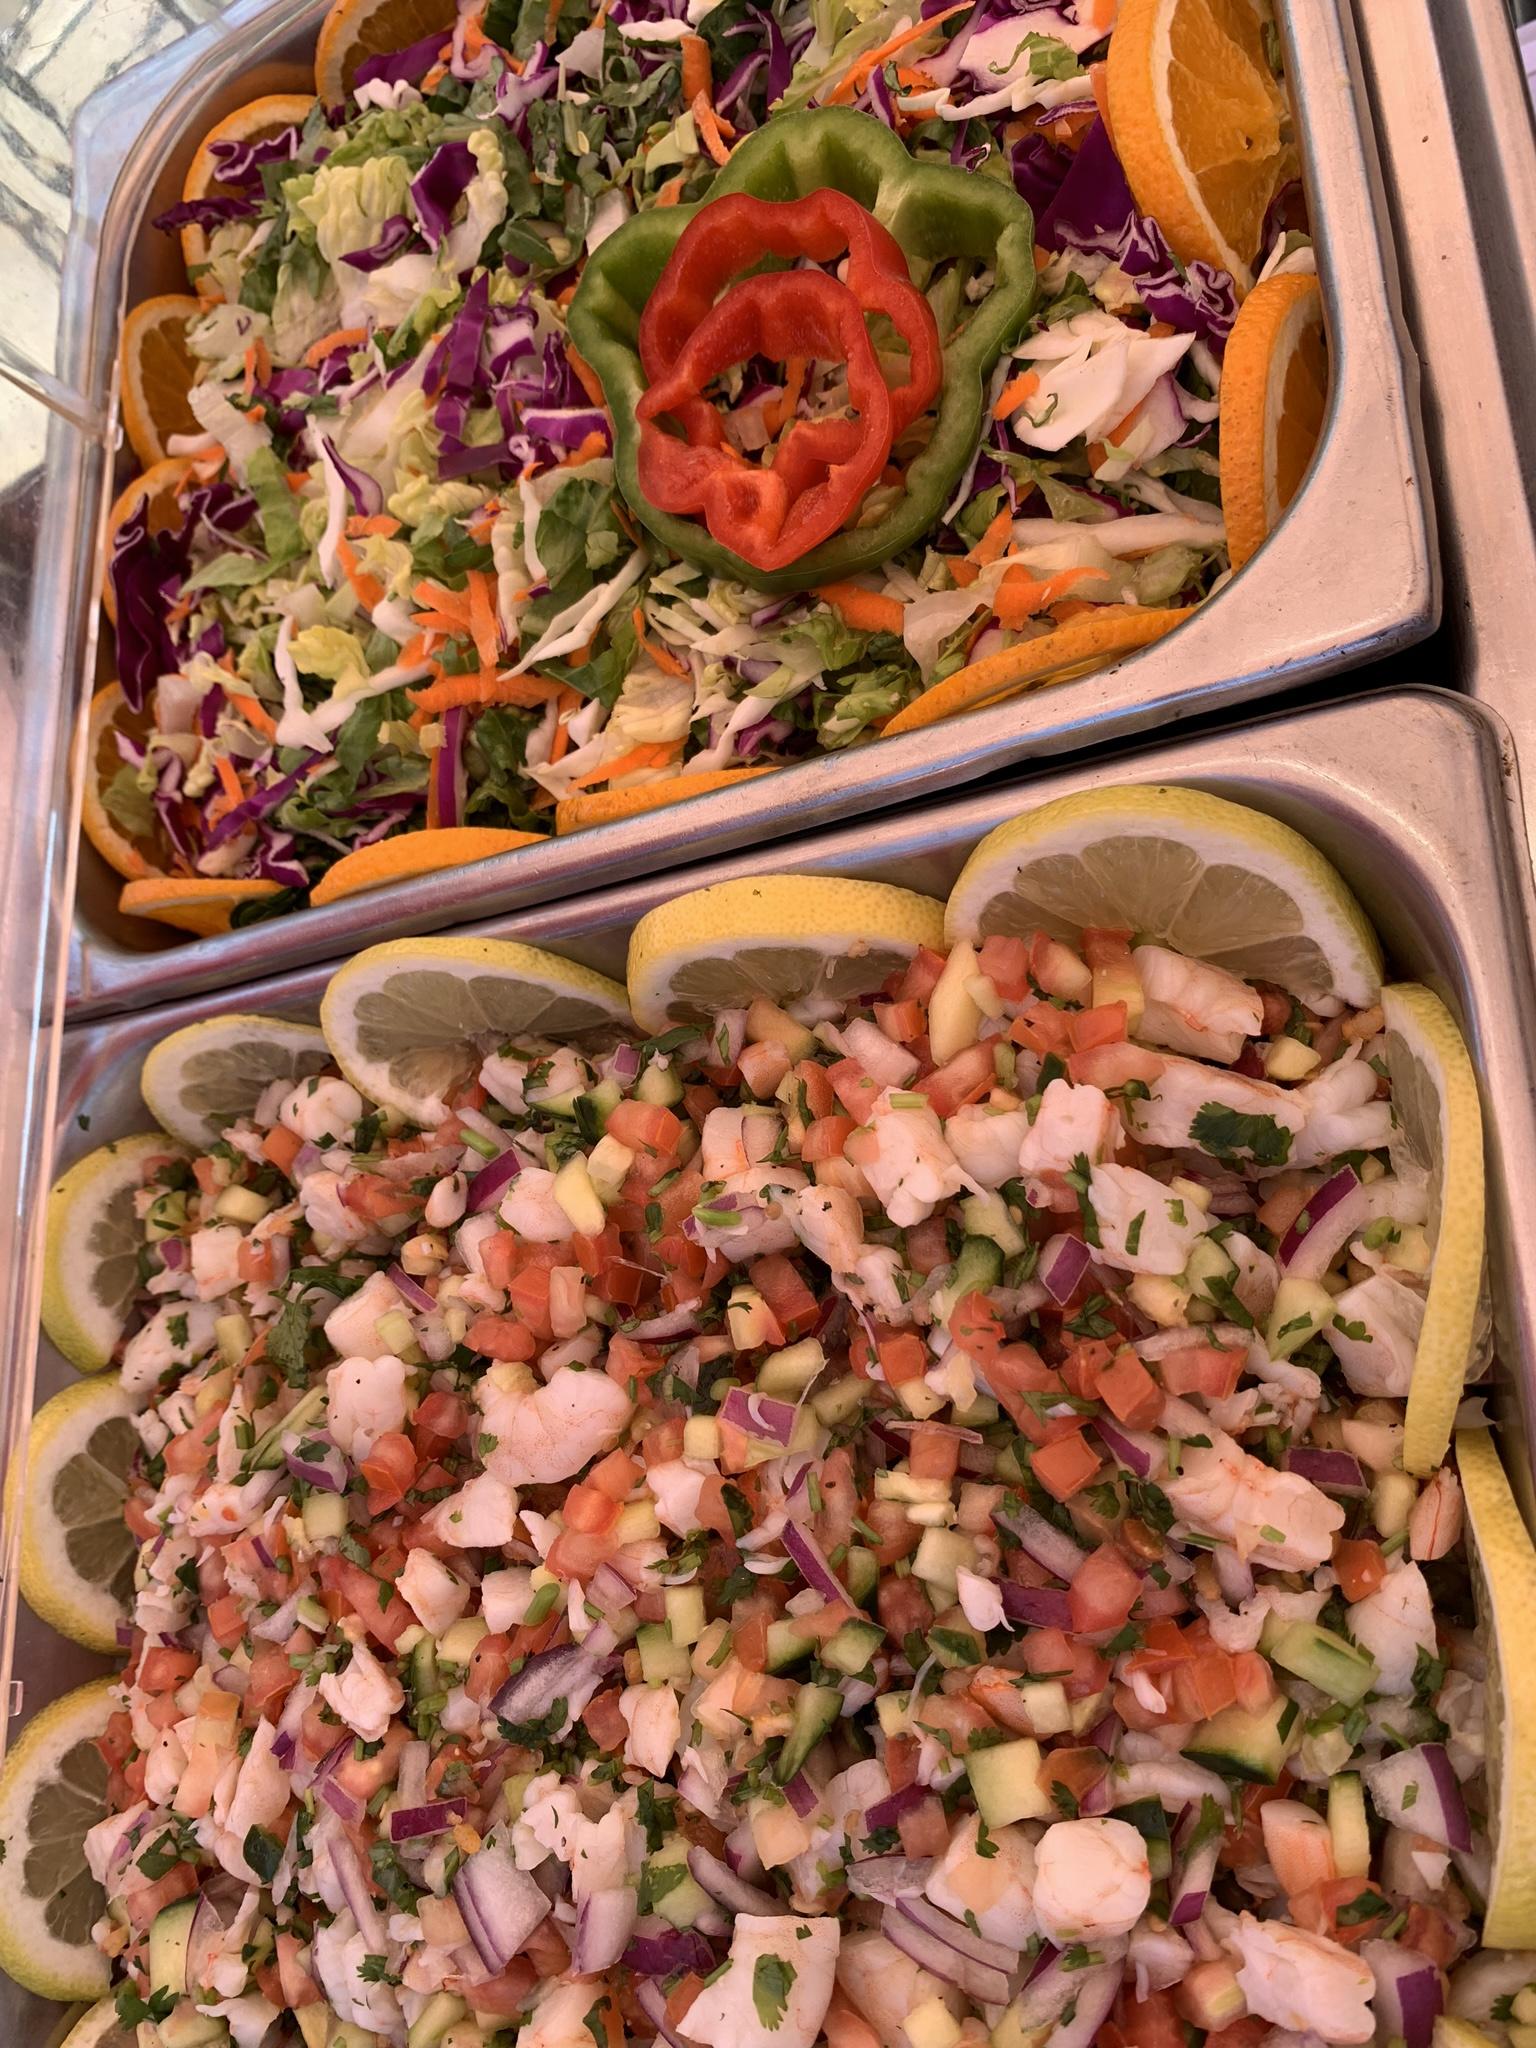 https://0201.nccdn.net/1_2/000/000/09f/6e5/ceviche-y-ensalada-buffet-1536x2048.jpg